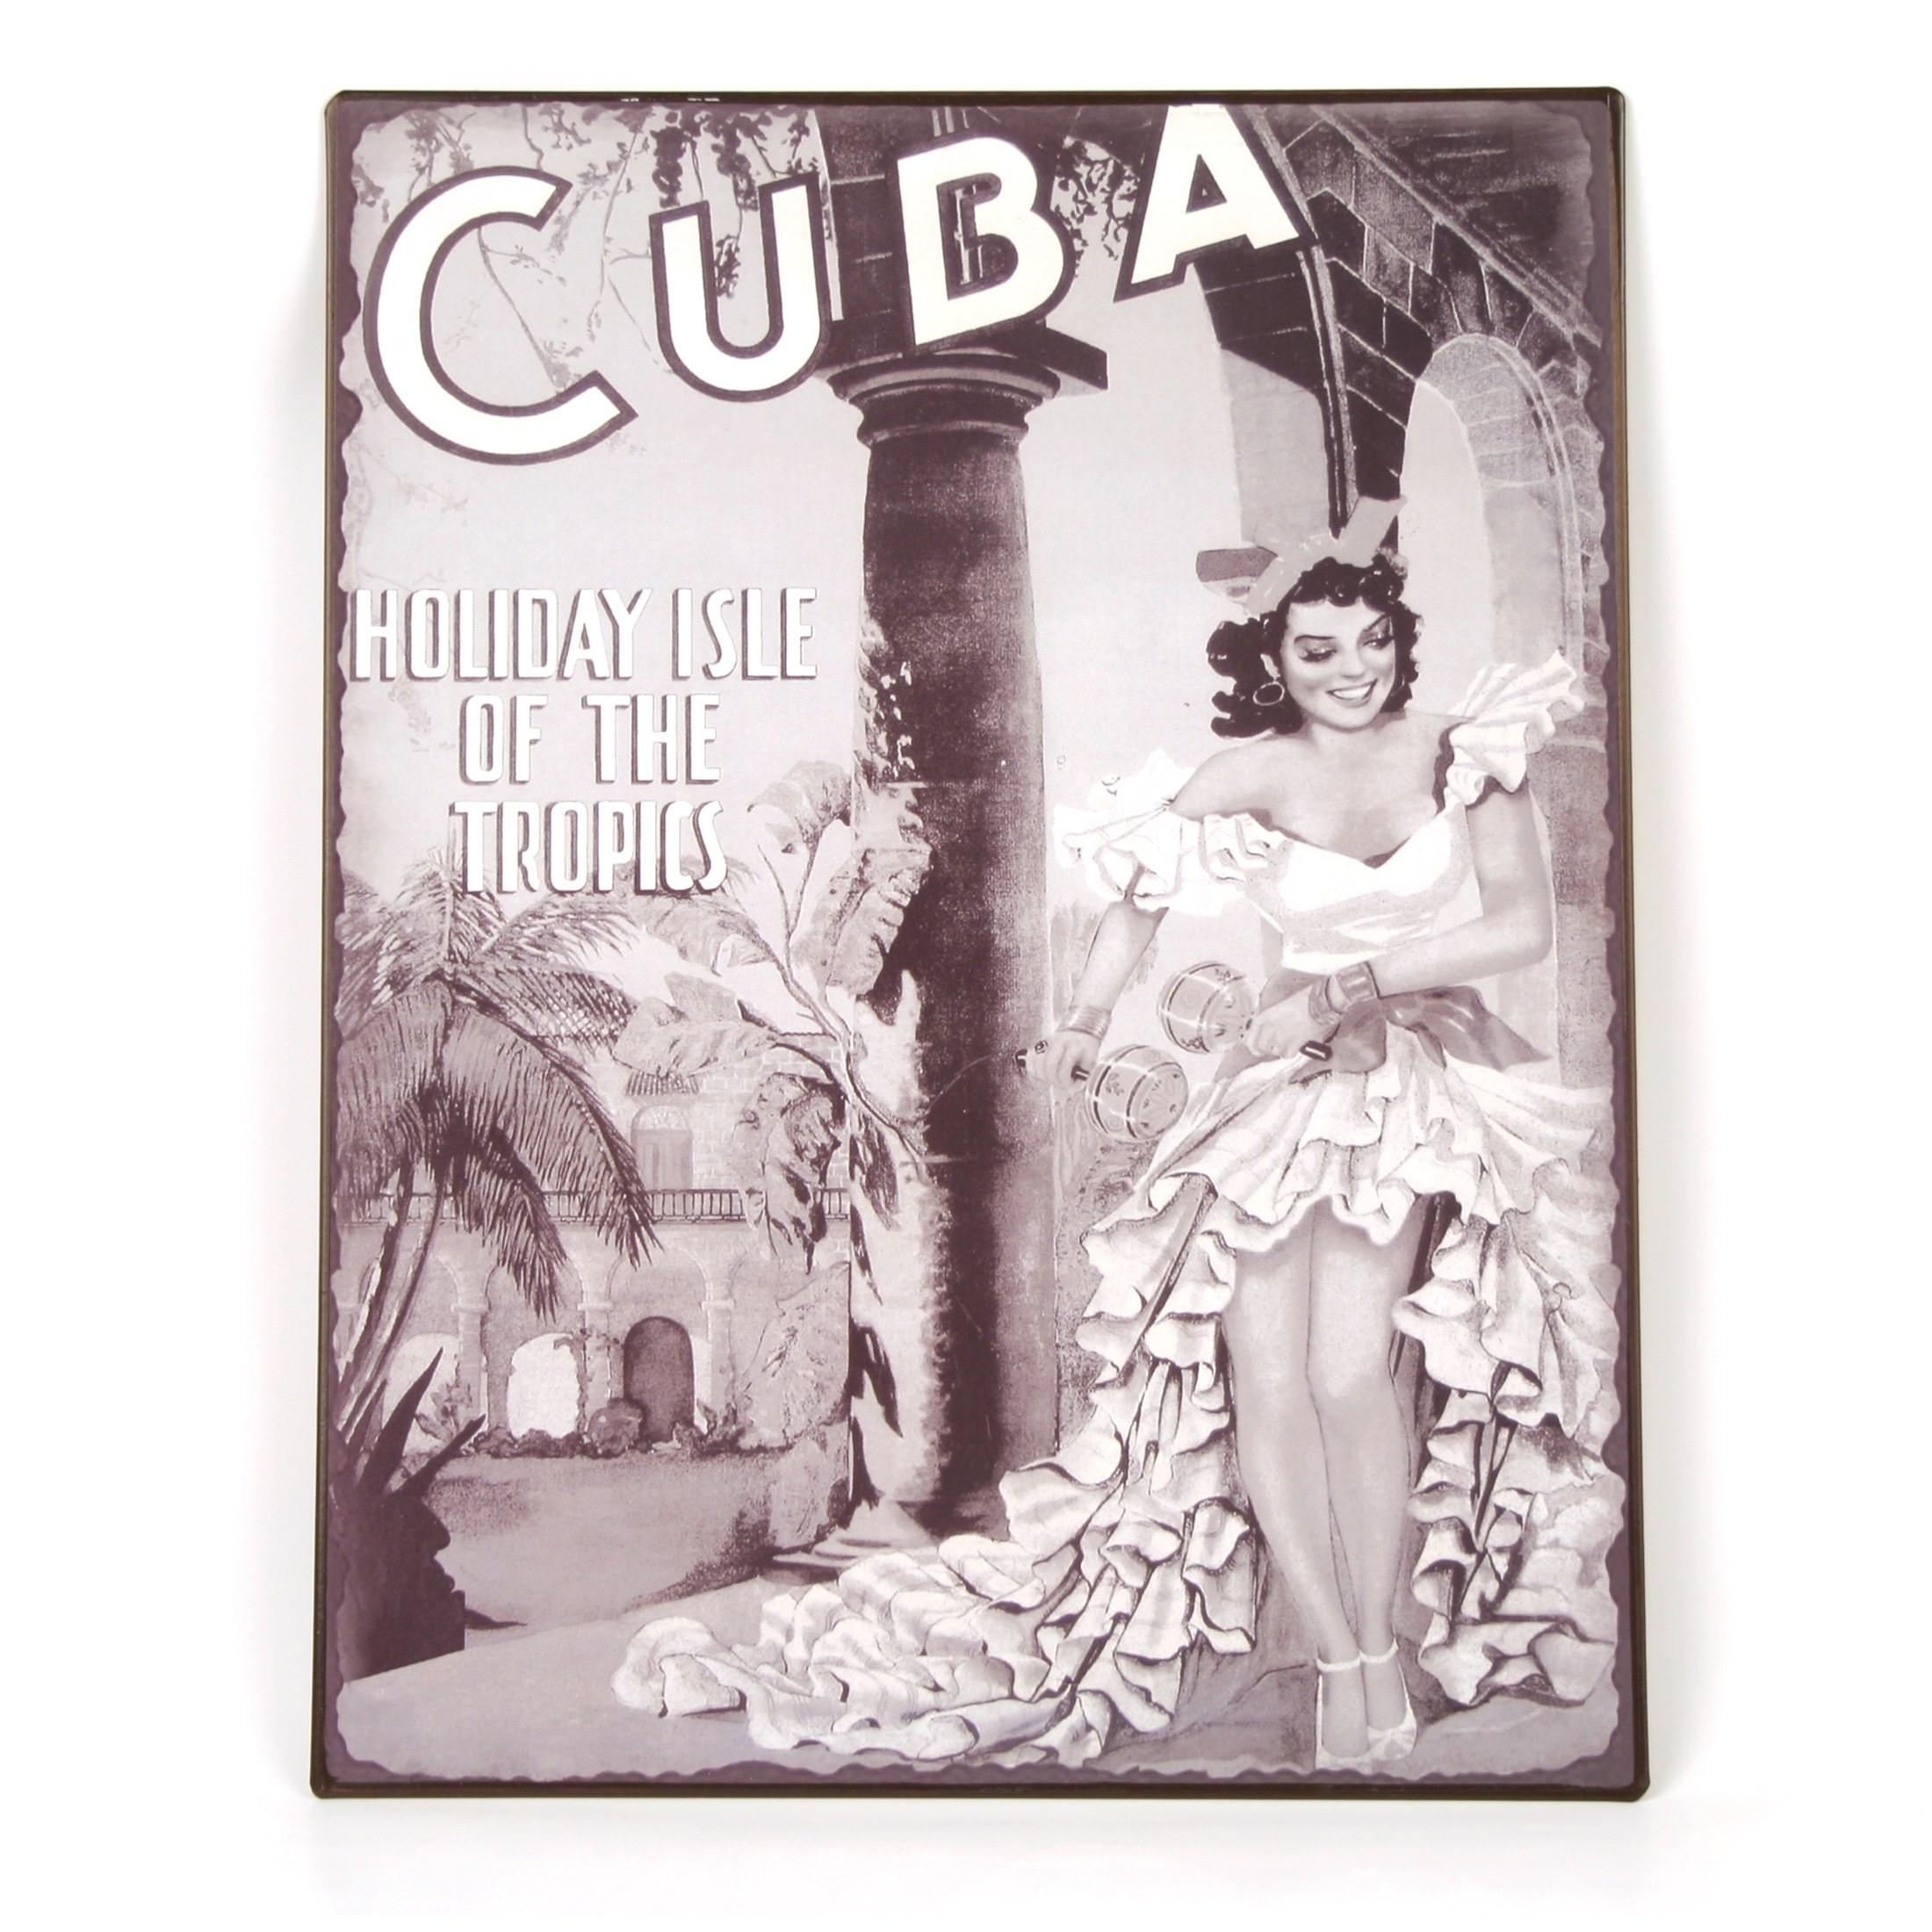 plakkaat cuba wanddecoratiestorenl stijlvolle